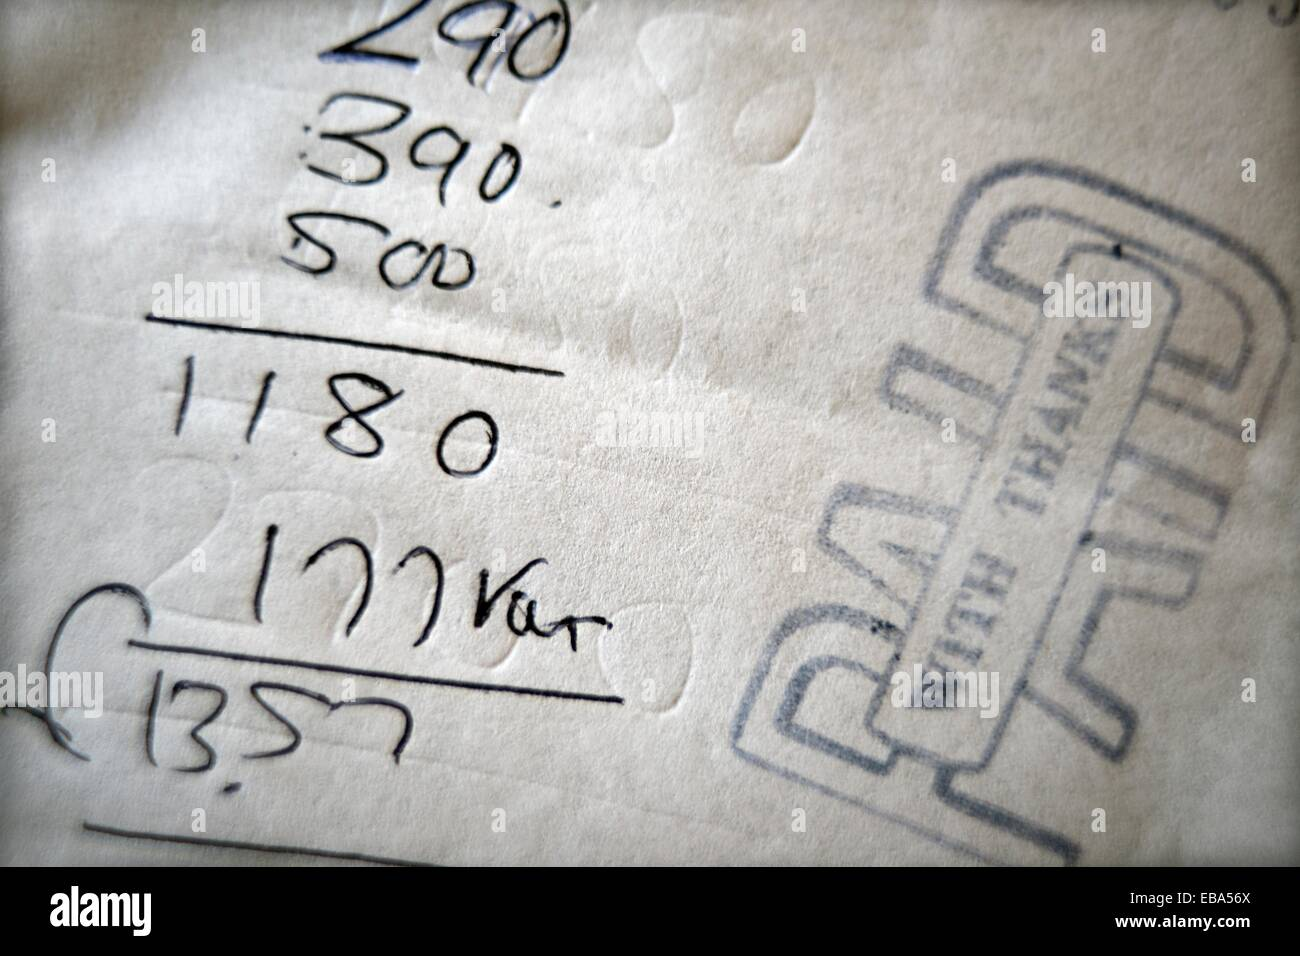 factura de restaurante, pagado, gracias, restaurant bill, paid with thanks - Stock Image